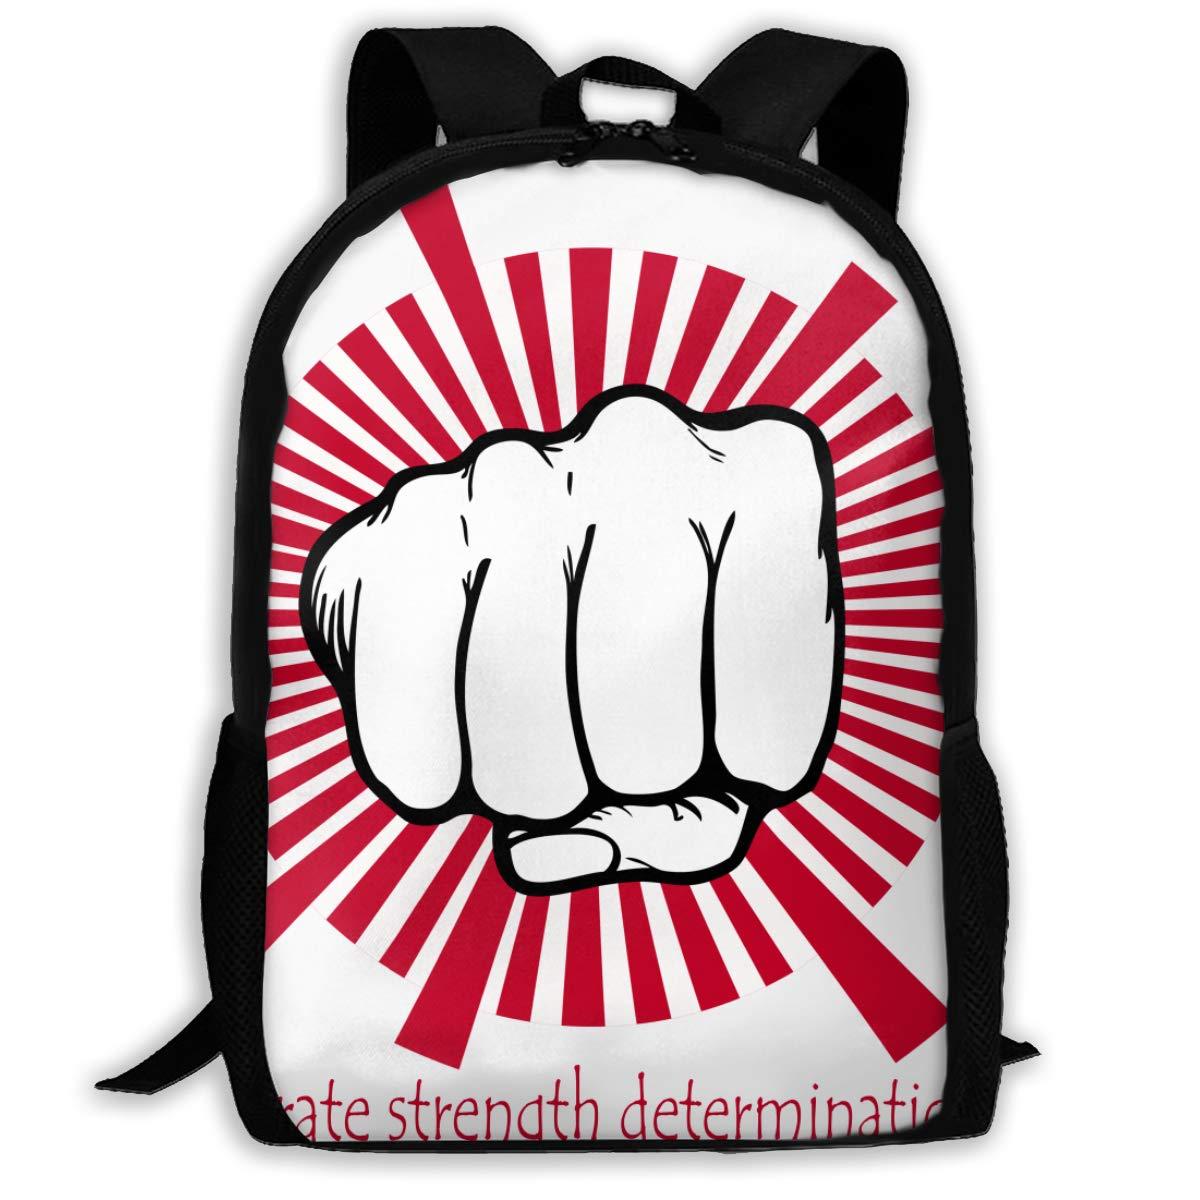 Karate Strength Determination Hip Hop Adult Unisex Shoulders Bag Taekwondo,shotokan Karate by Beatthebox